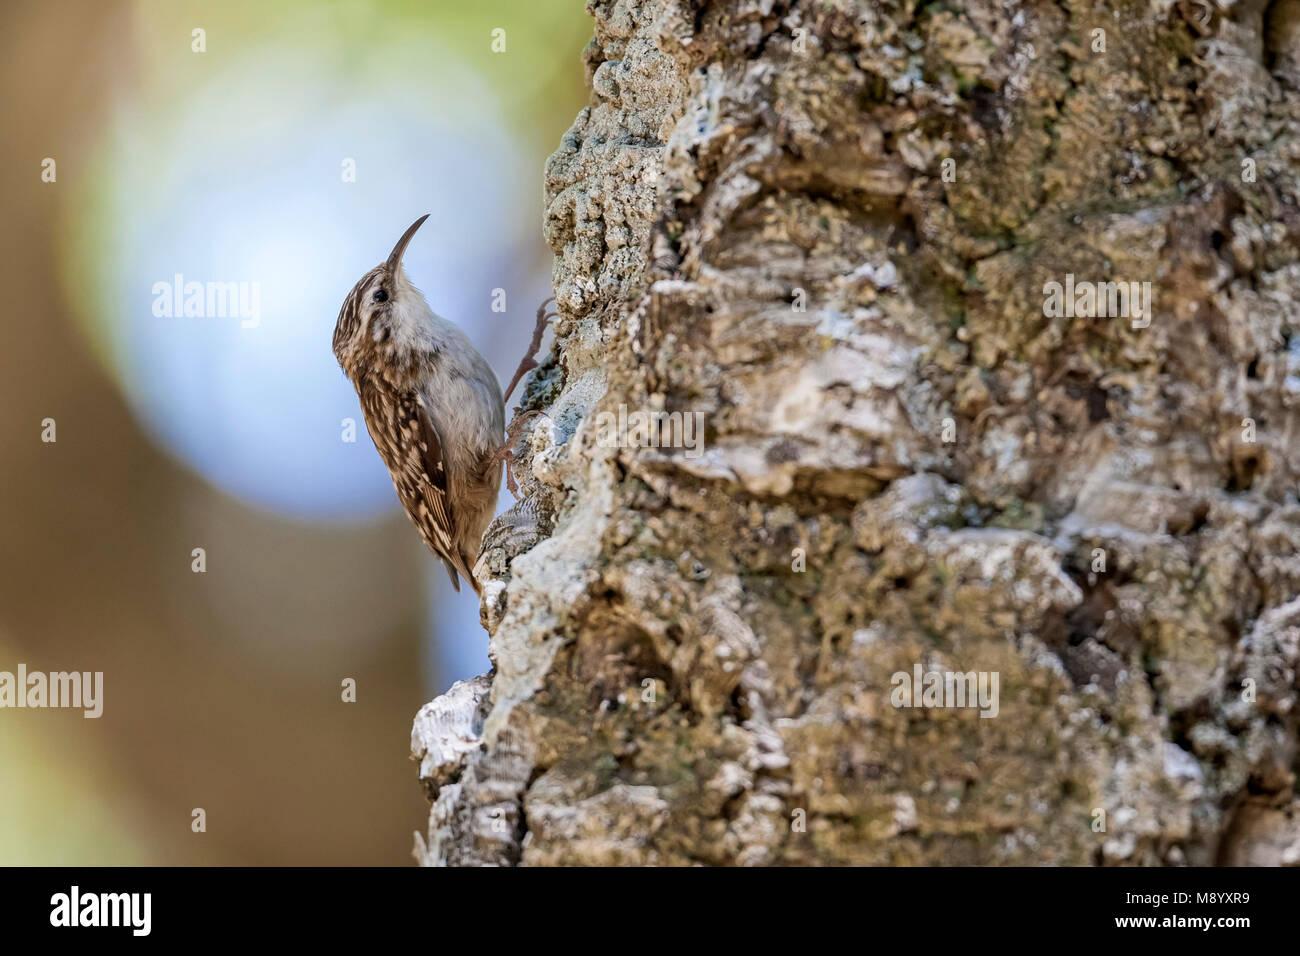 Afrikaanse Boomkruiper, African Short-toed Tree-Creeper (Certhia brachydactyla mauritanica) - Stock Image